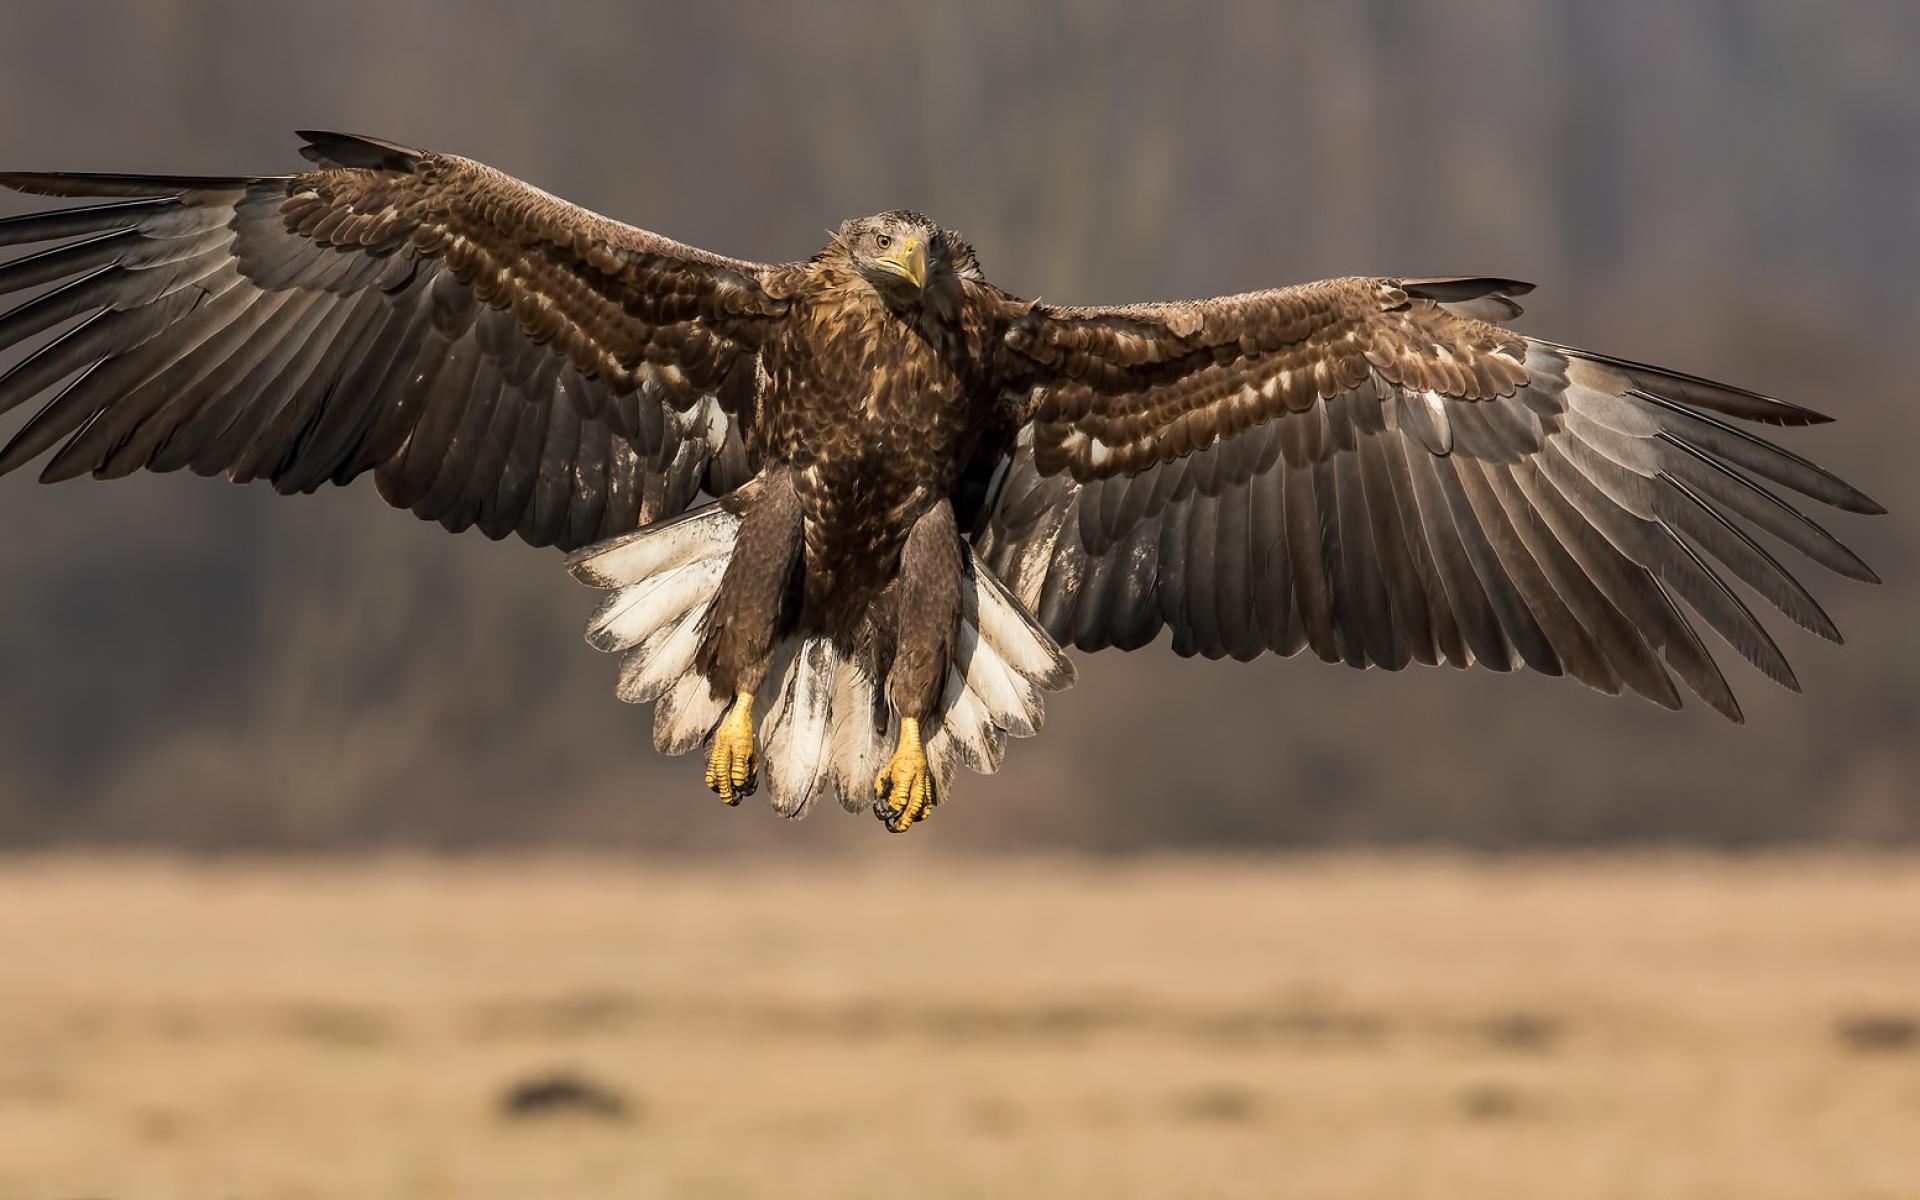 Un águila con las alas extendidas - 1920x1200